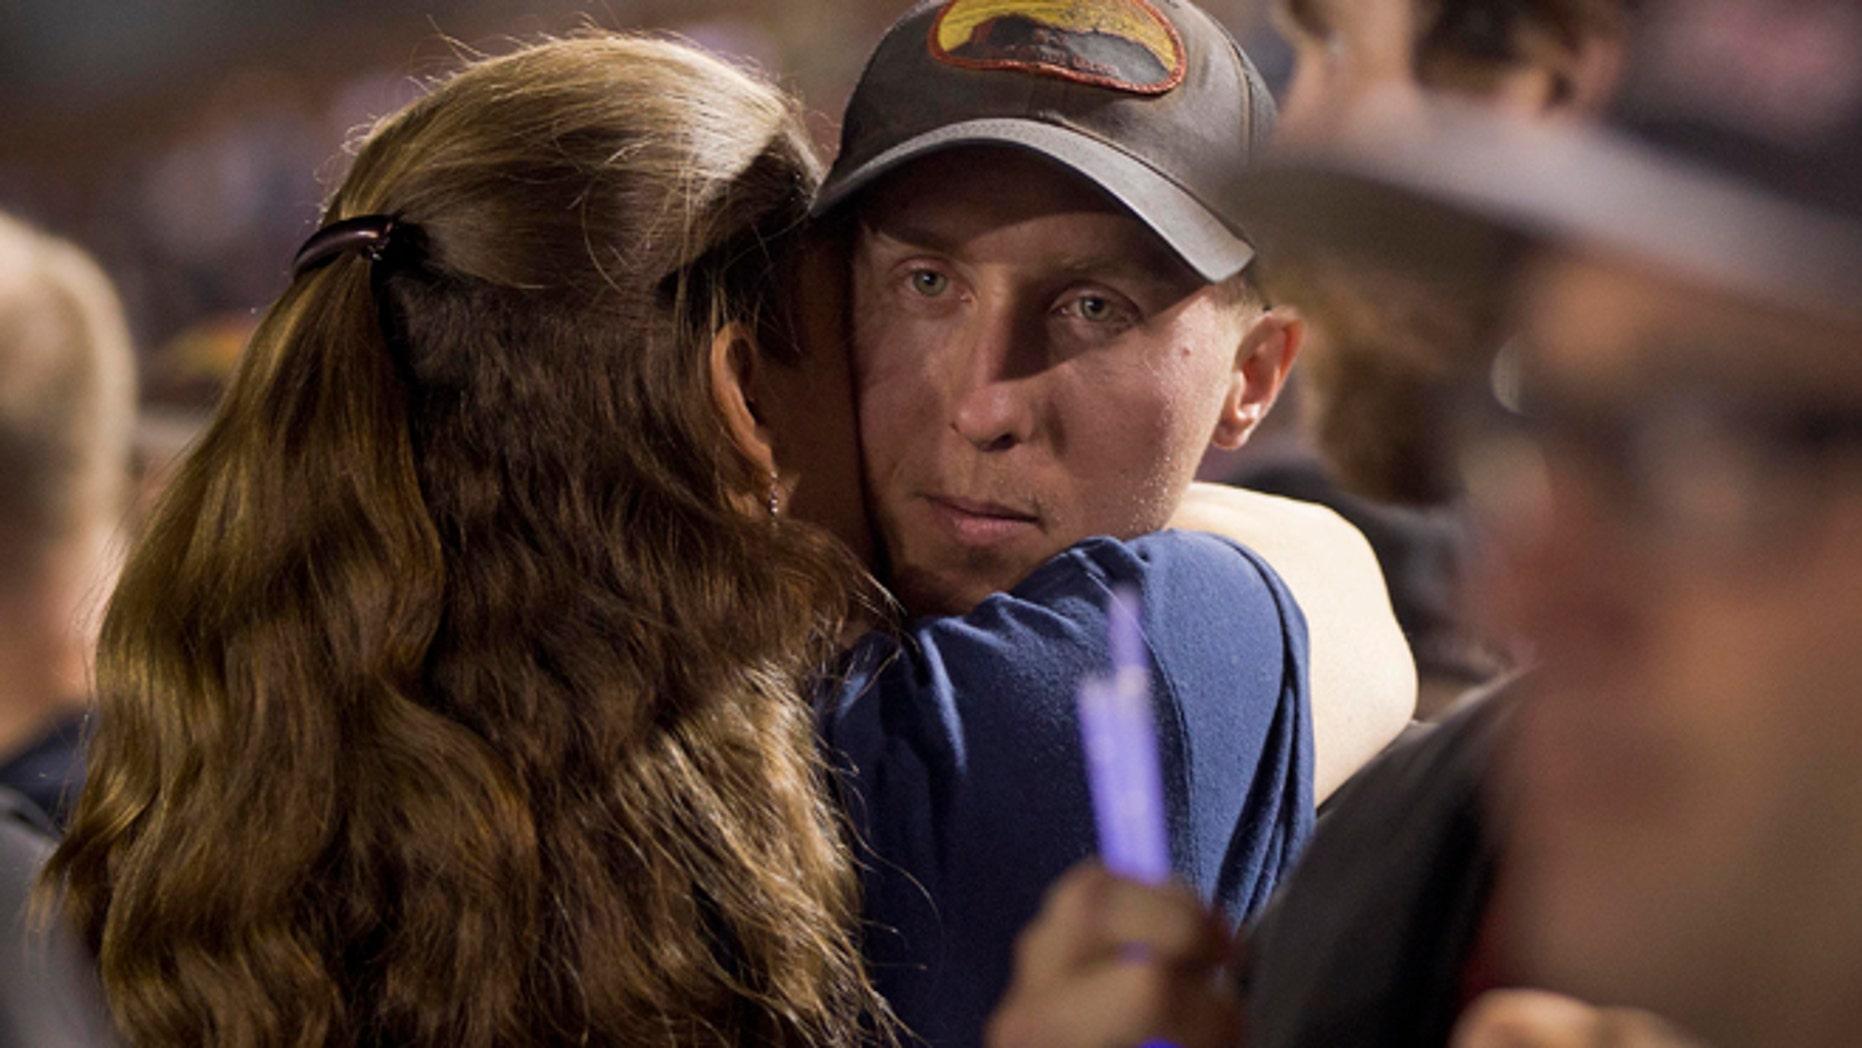 July 2: Firefighter Brendan McDonough embraces a mourner near the end of a candlelight vigil in Prescott, Ariz.